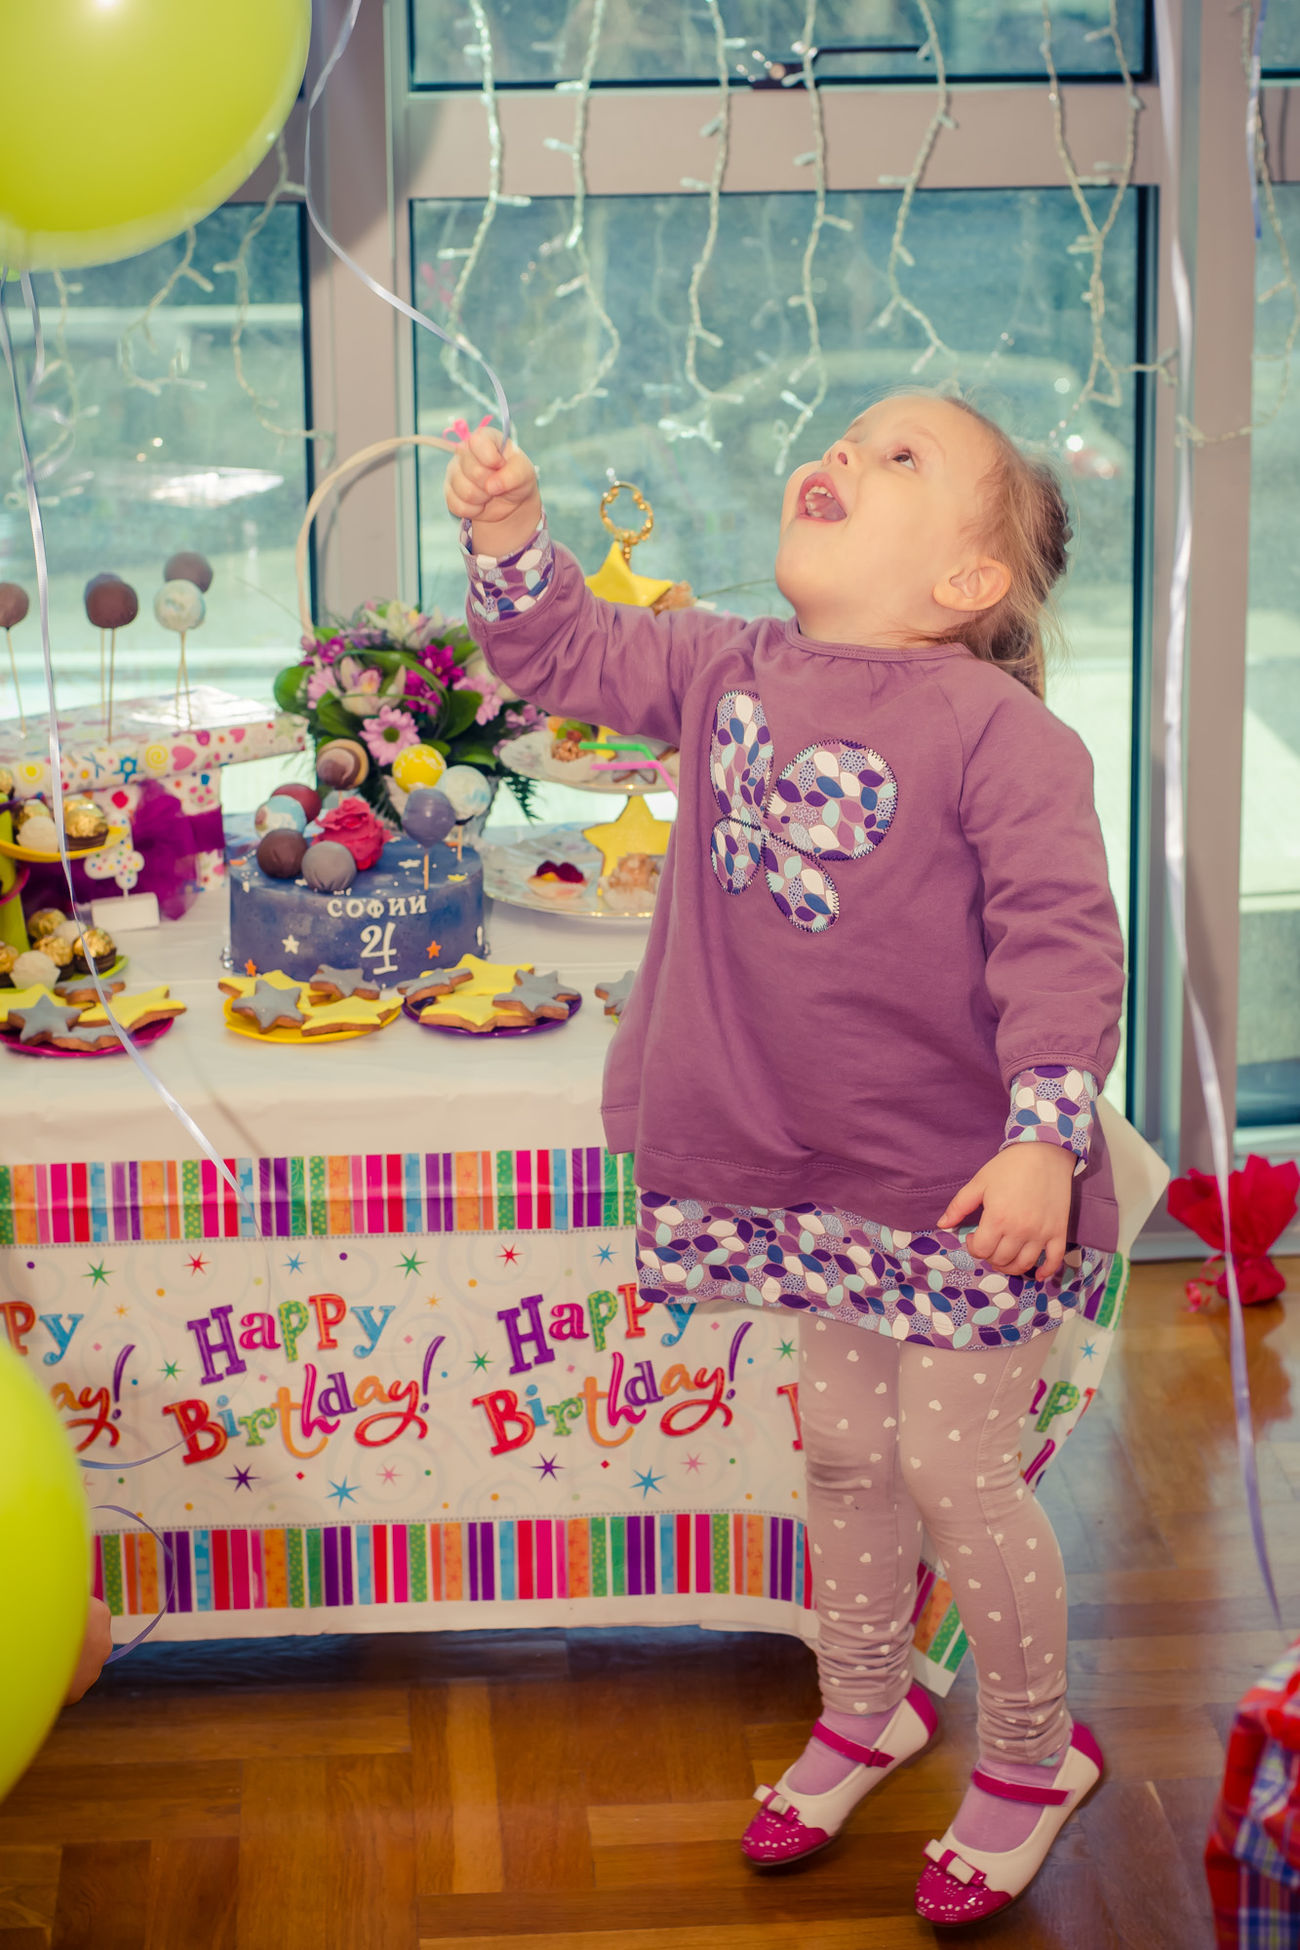 Birthday Happiness Birthday Party Anasta Petrova Eye4photography  Cg  Crna Gora фотографчерногория Podgorica Ulcinj Montenegro EyeEm Best Shots Taking Photos Enjoying Life